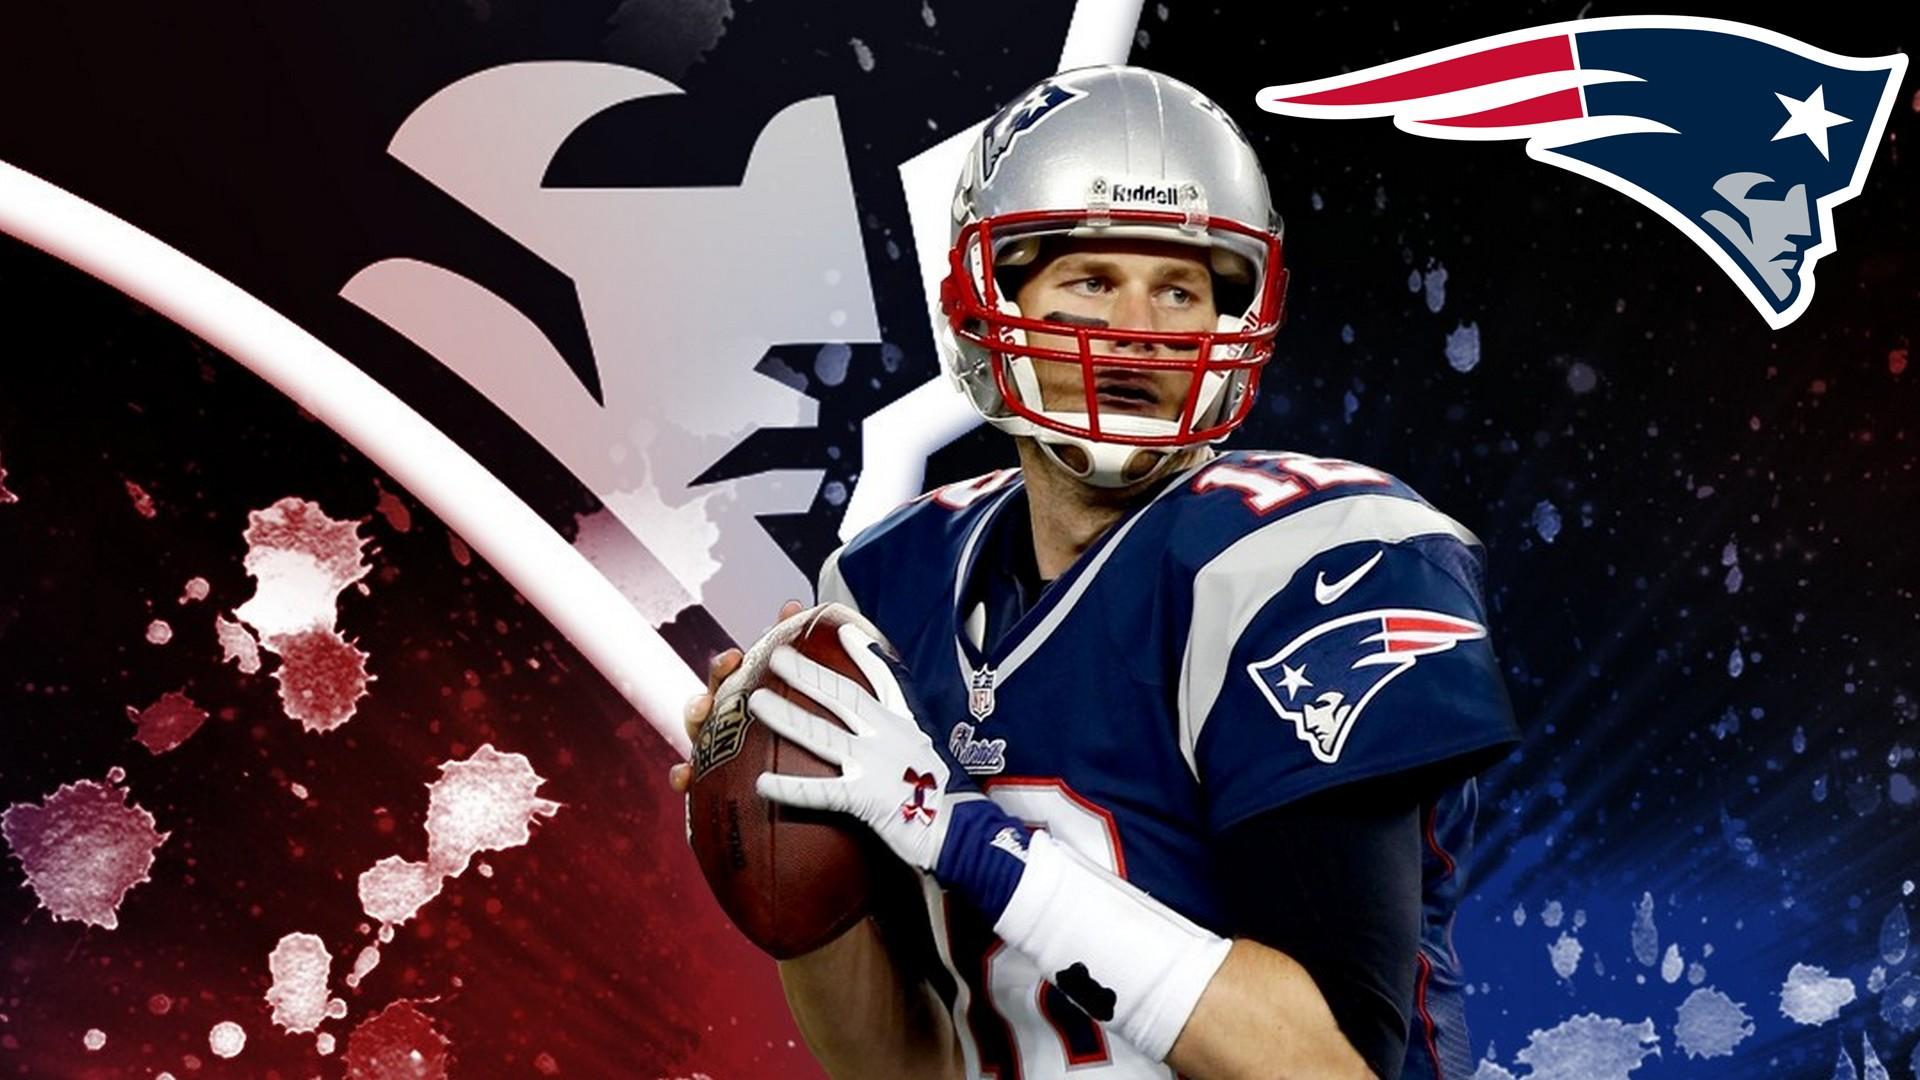 great man Tom Brady Wallpaper